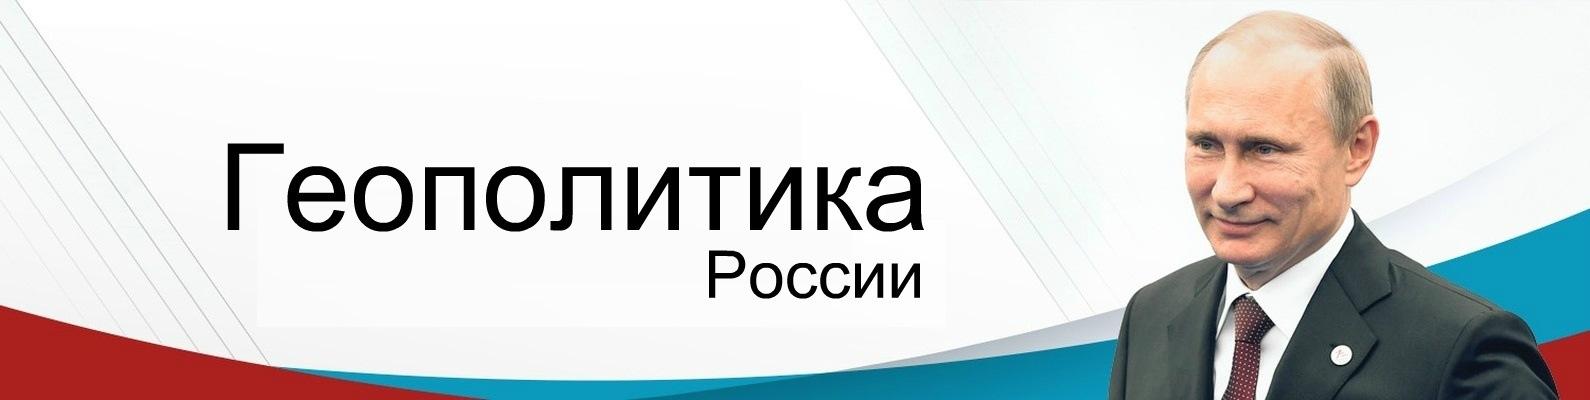 ostr russian geopolitics due - 1590×400